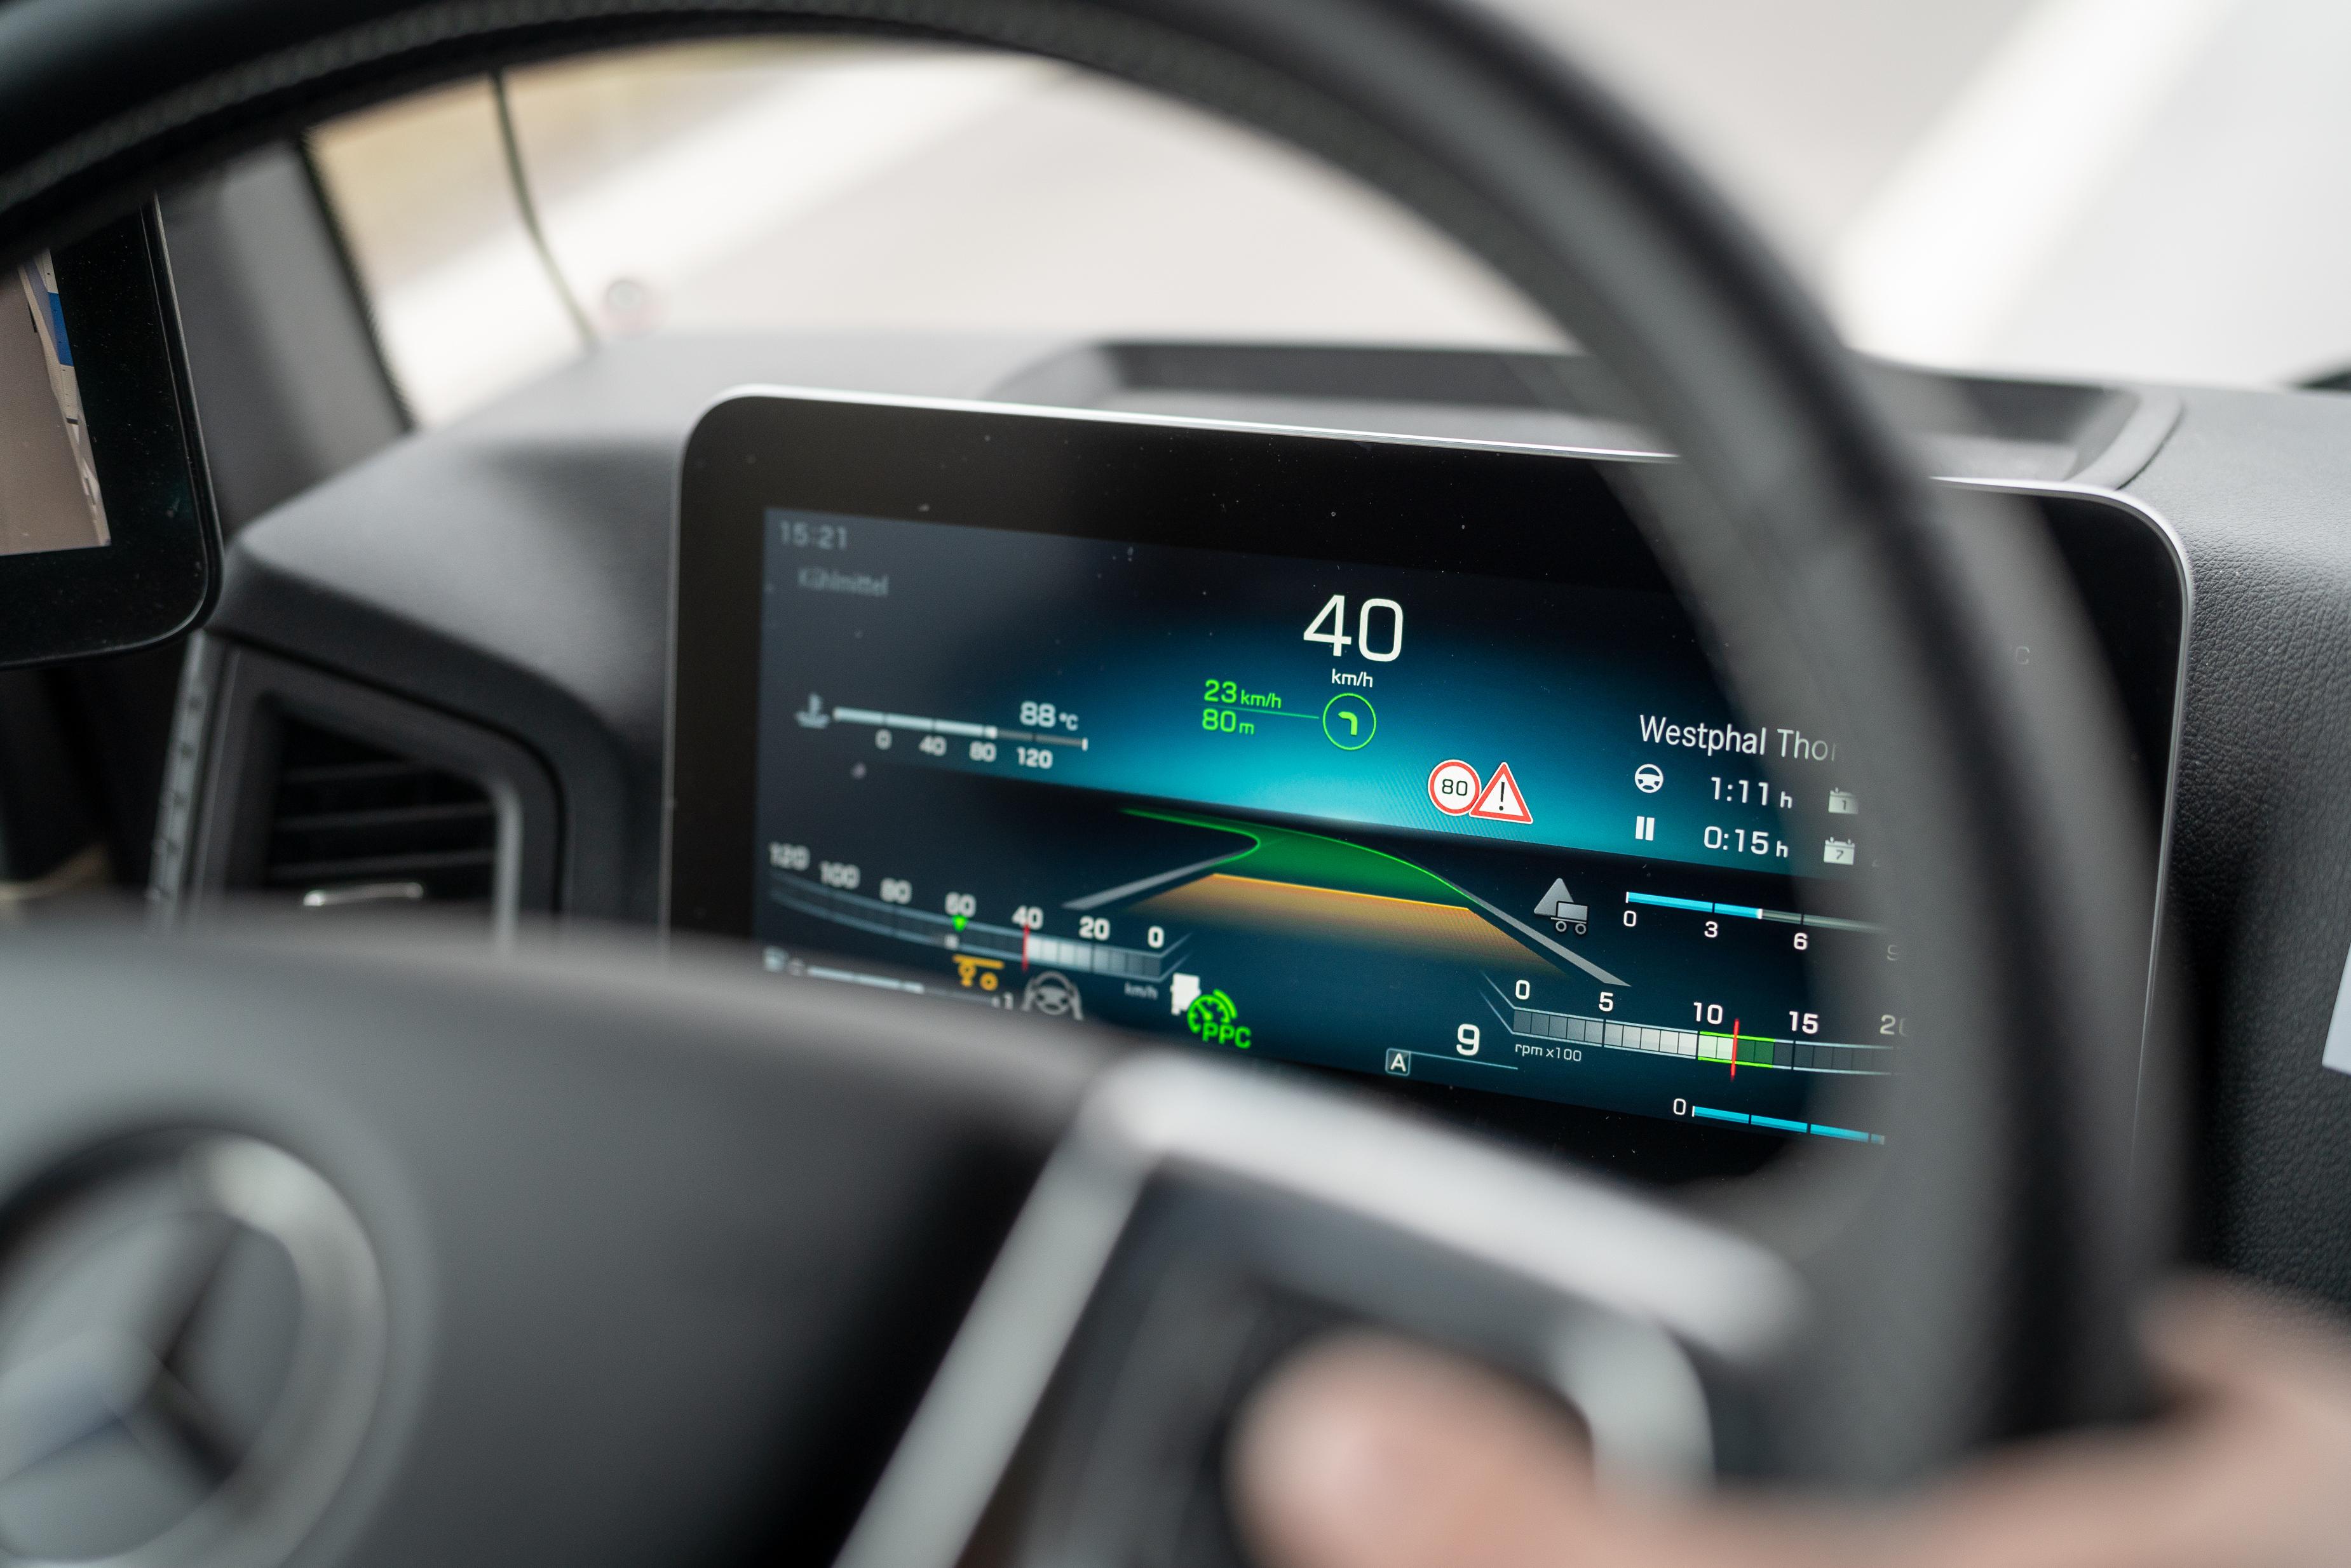 Mercedes Actros Active Drive Assist